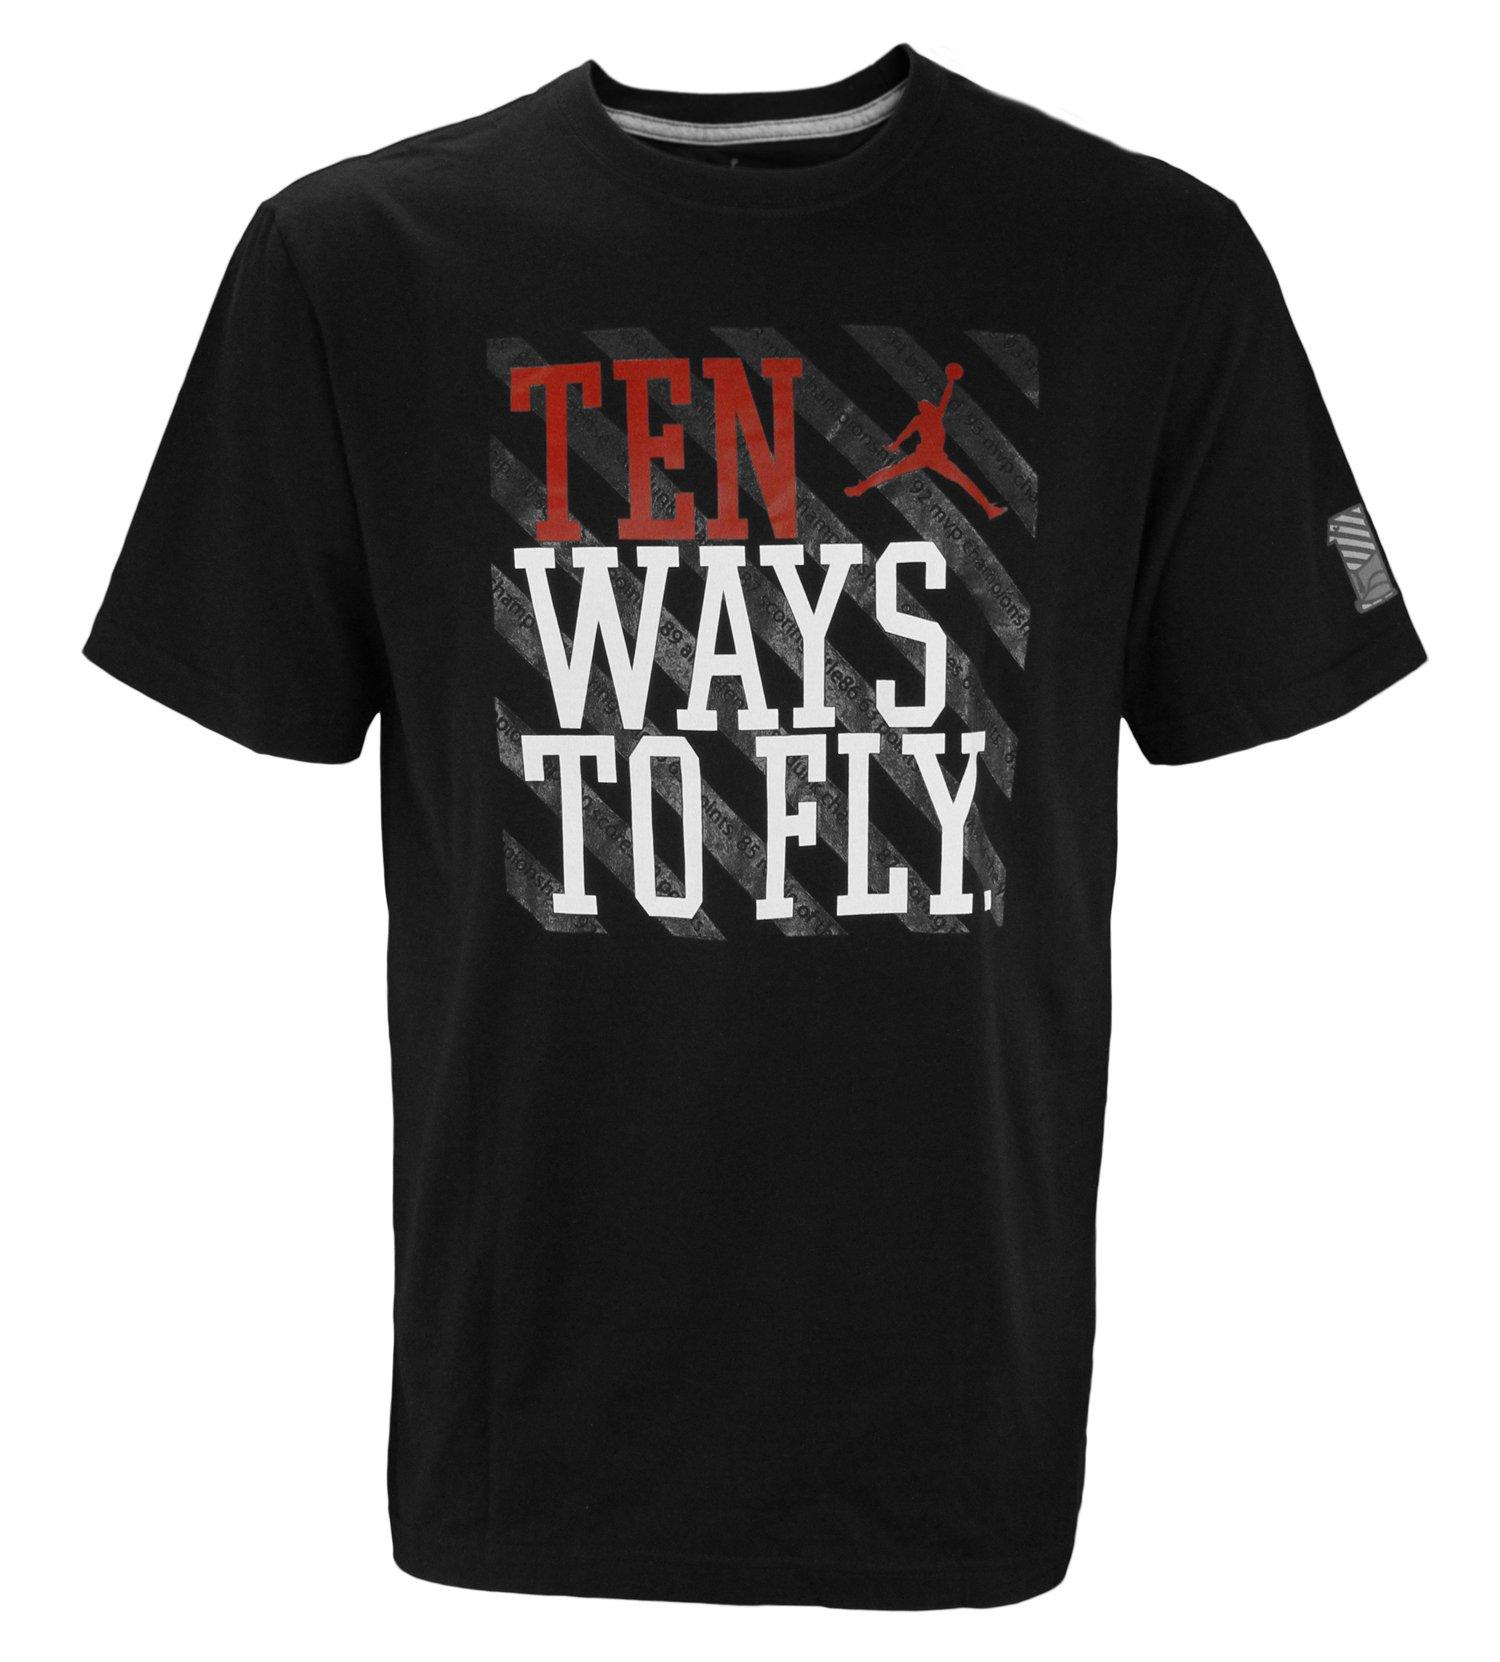 Mens Air Jordan Ten Ways To Fly T-Shirt, Black by Jordan